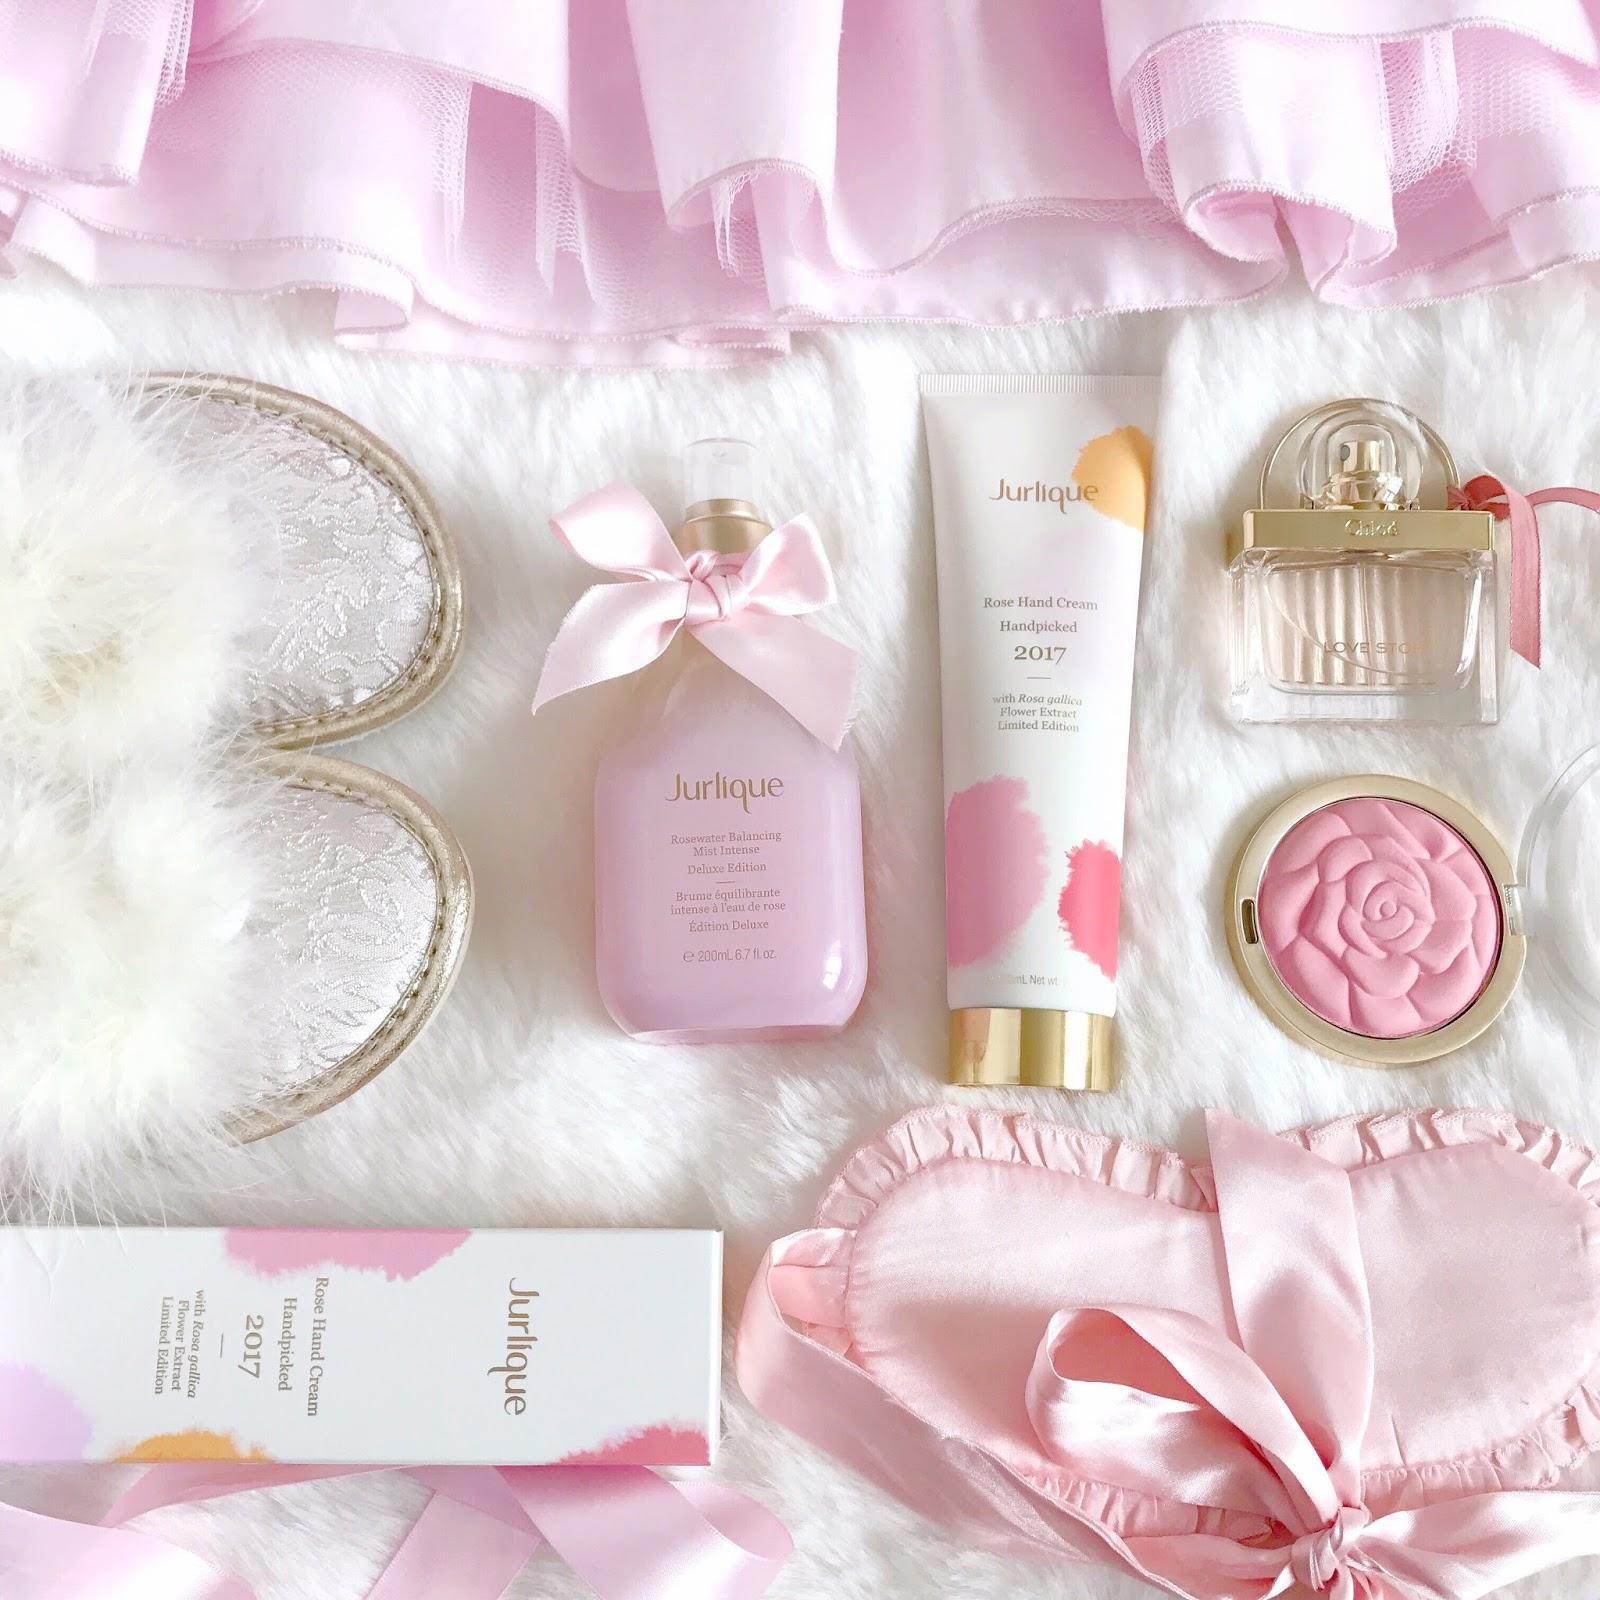 Jurlique Rose Petal Limited Edition 2017